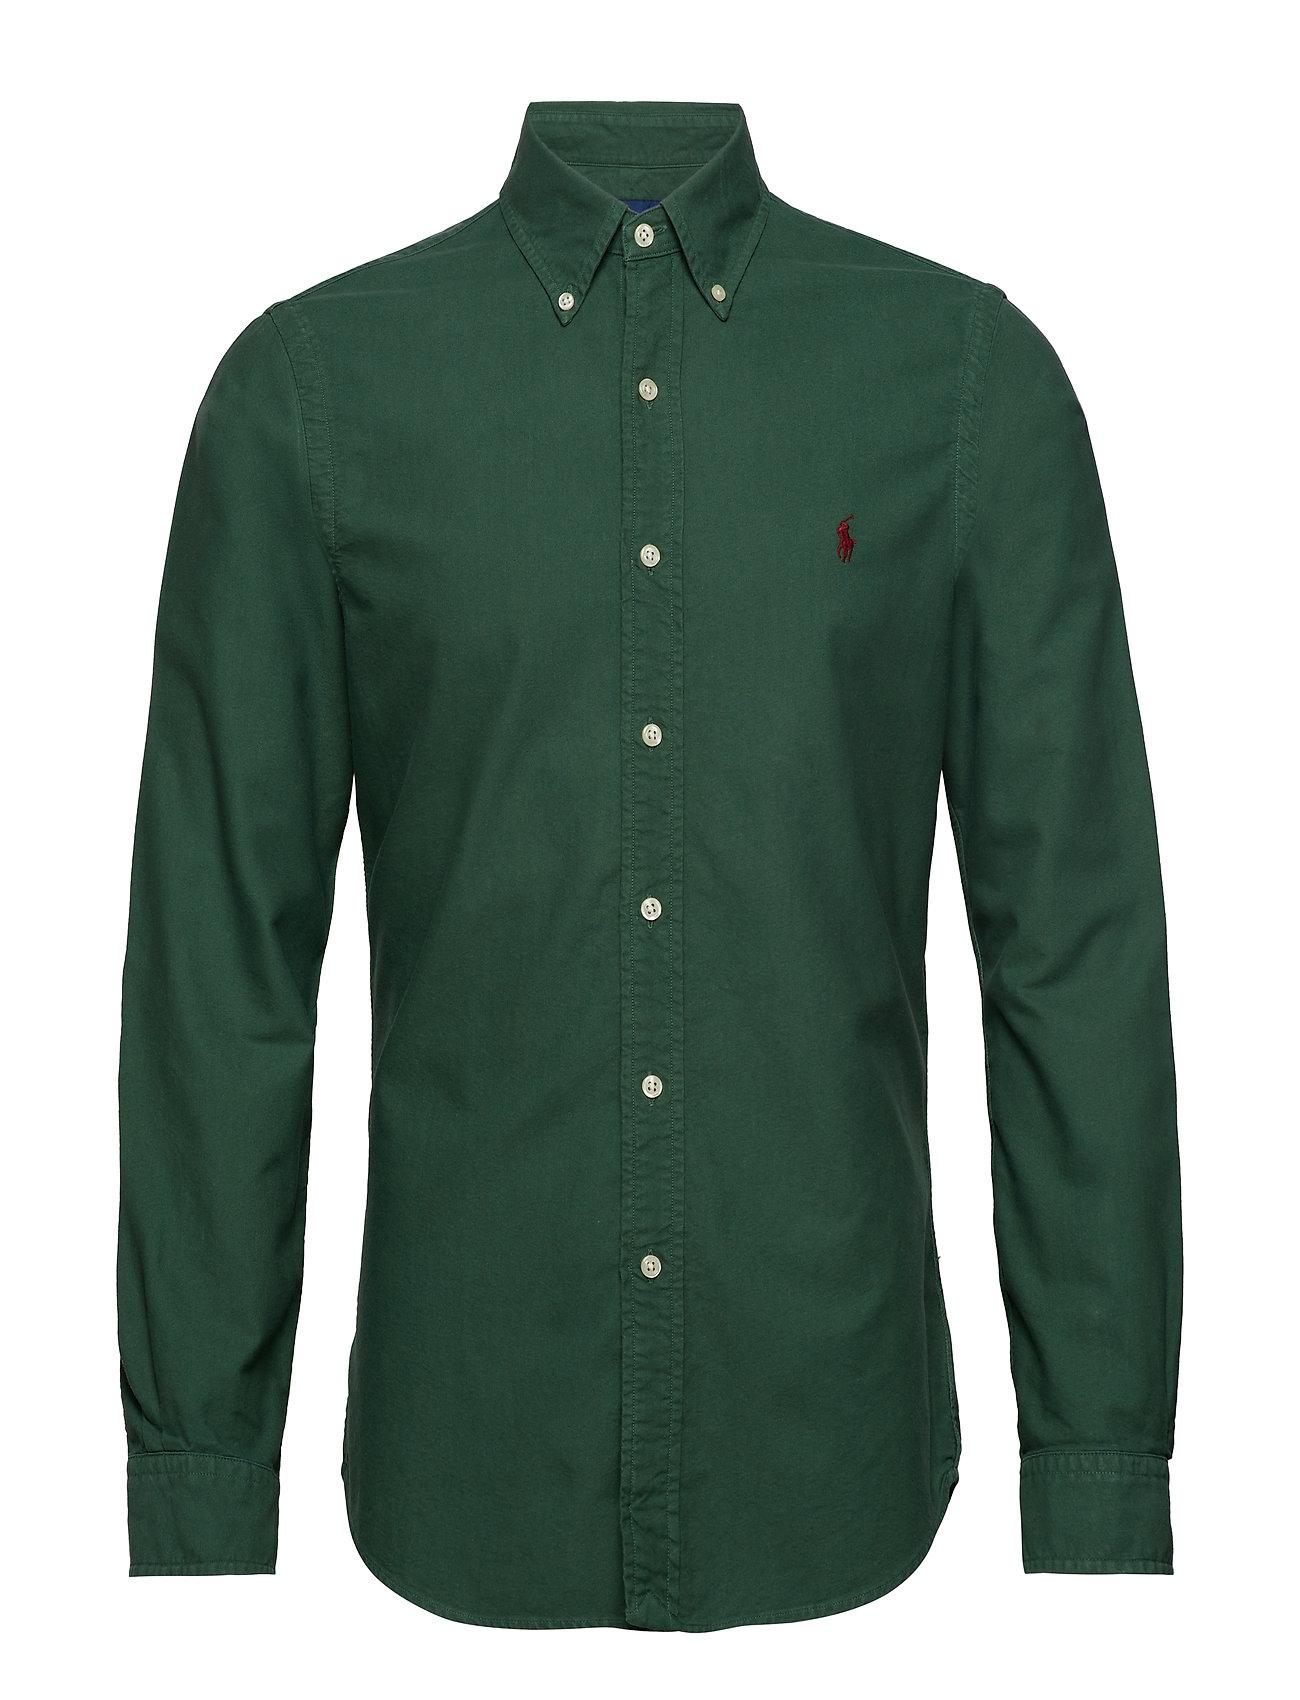 Polo Ralph Lauren Slim Fit Cotton Oxford Shirt - STUART GREEN